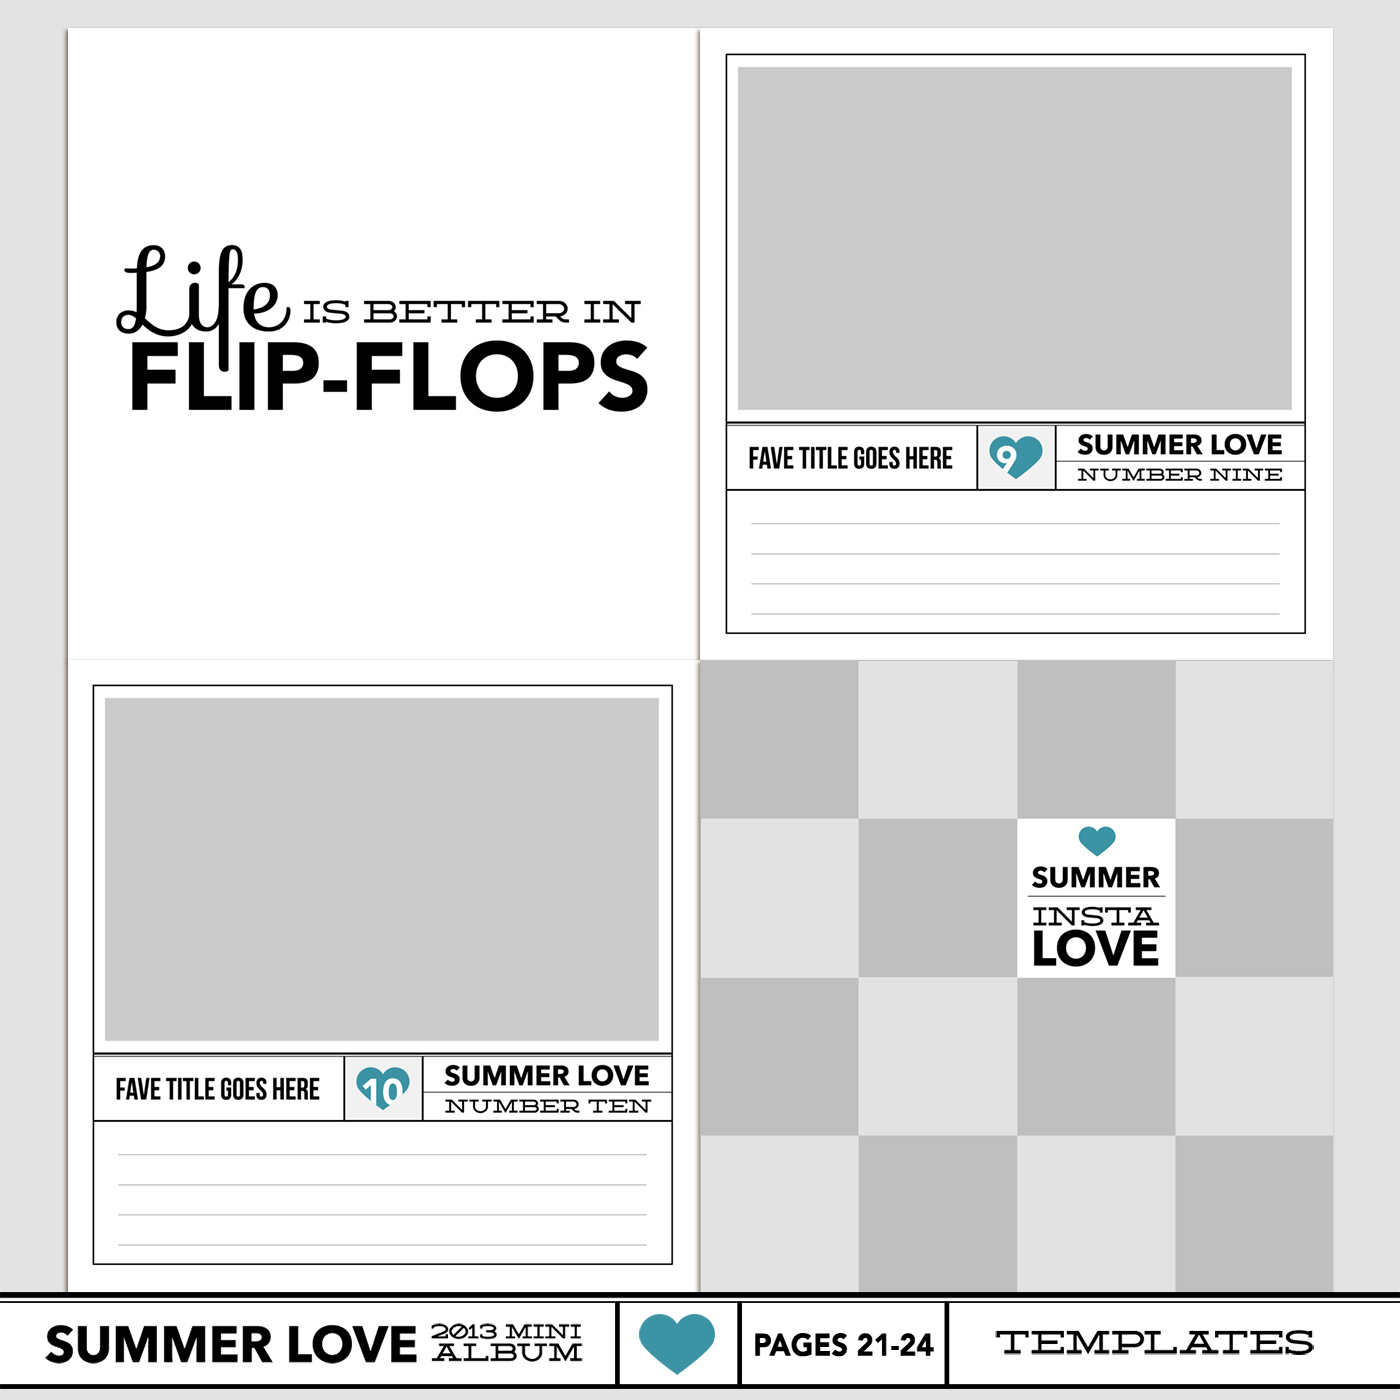 nettiodesigns_SummerLove-pg21-24-Templates-1400